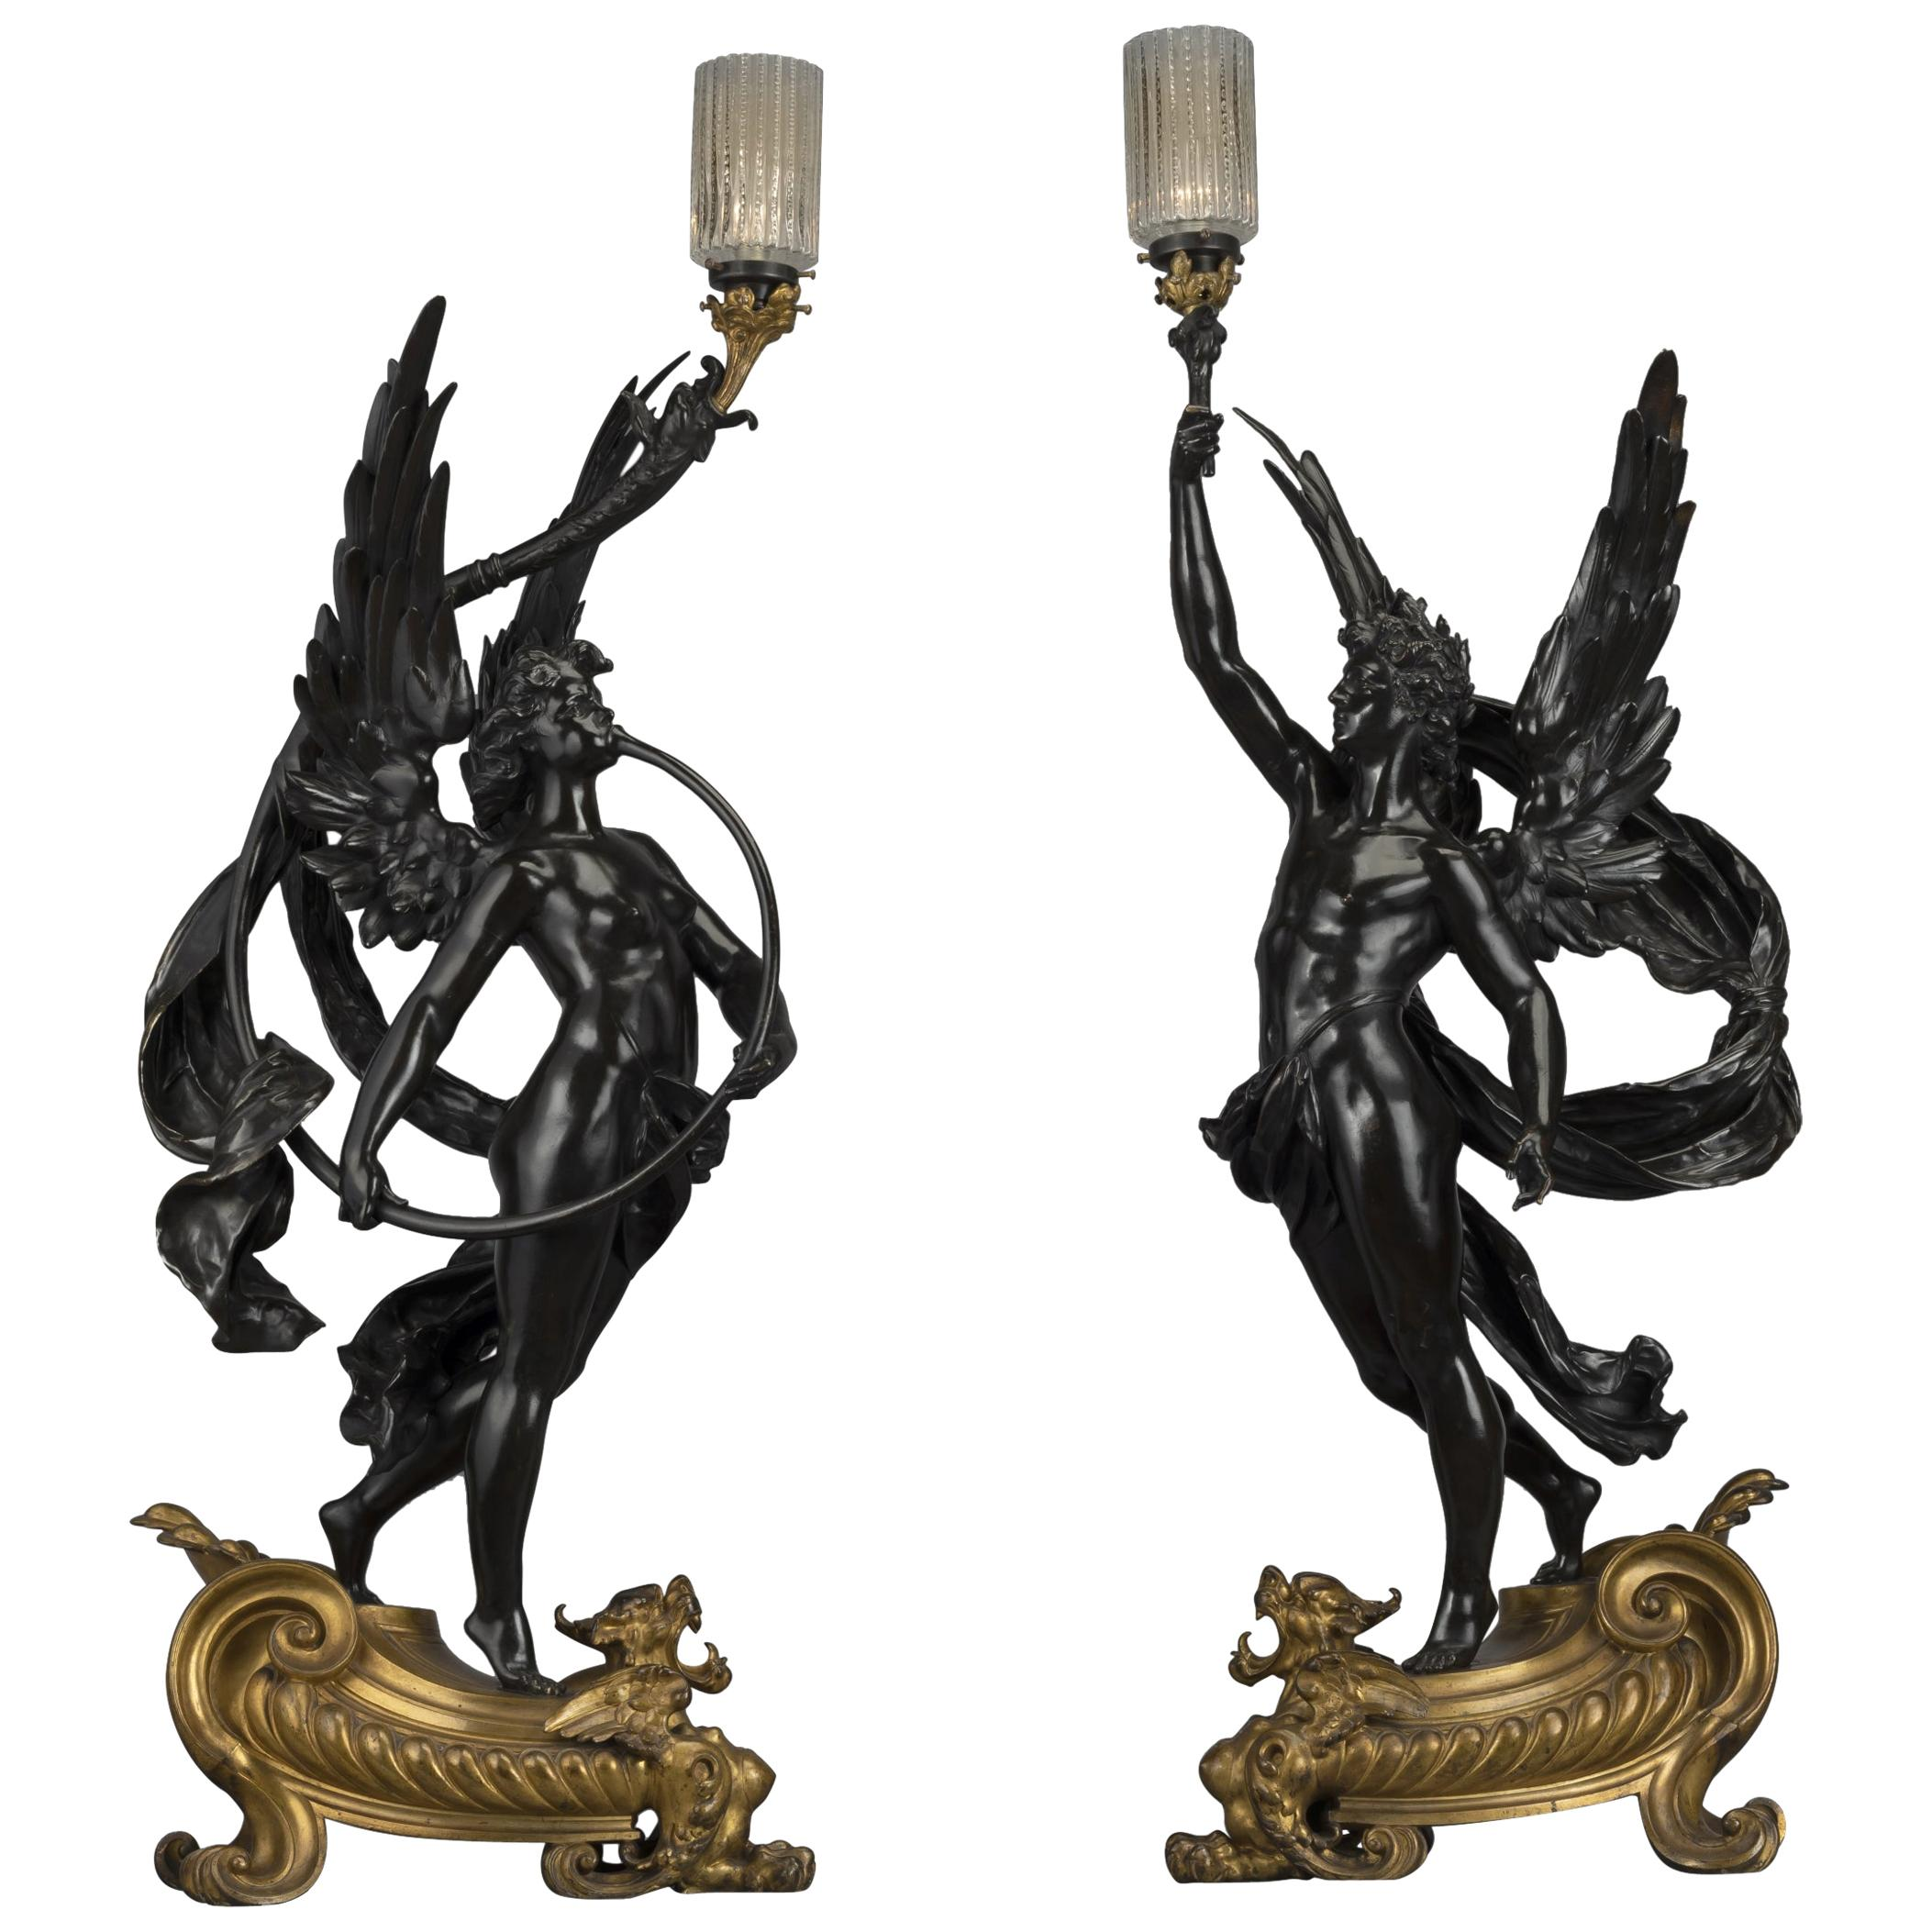 Pair of Gilt & Patinated Bronze Figural Torcheres by Bouchon, Paris, circa 1900